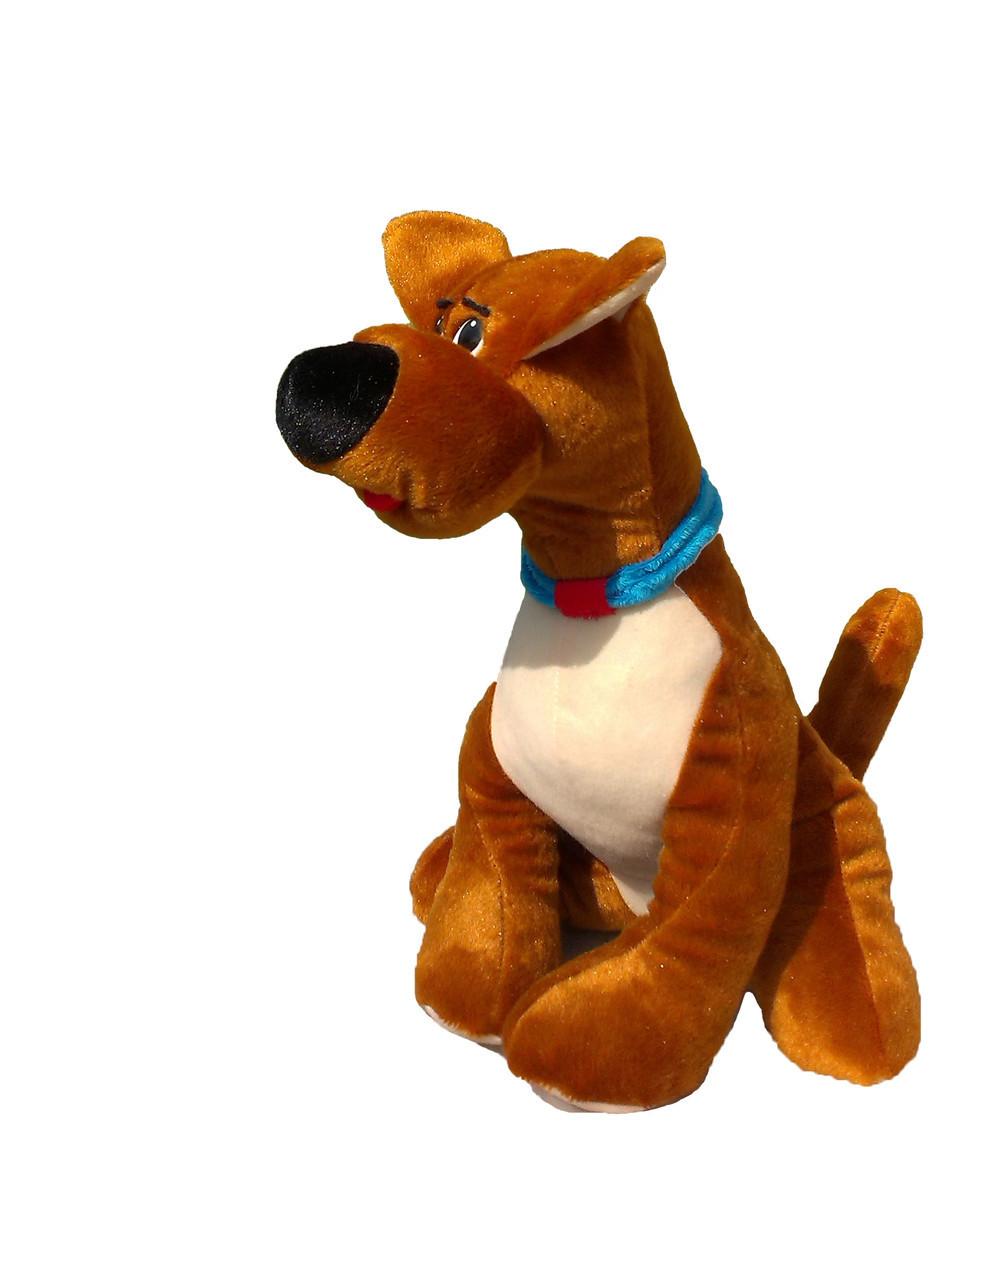 Мягкая игрушка Собачка Скуби 35 см, фото 1